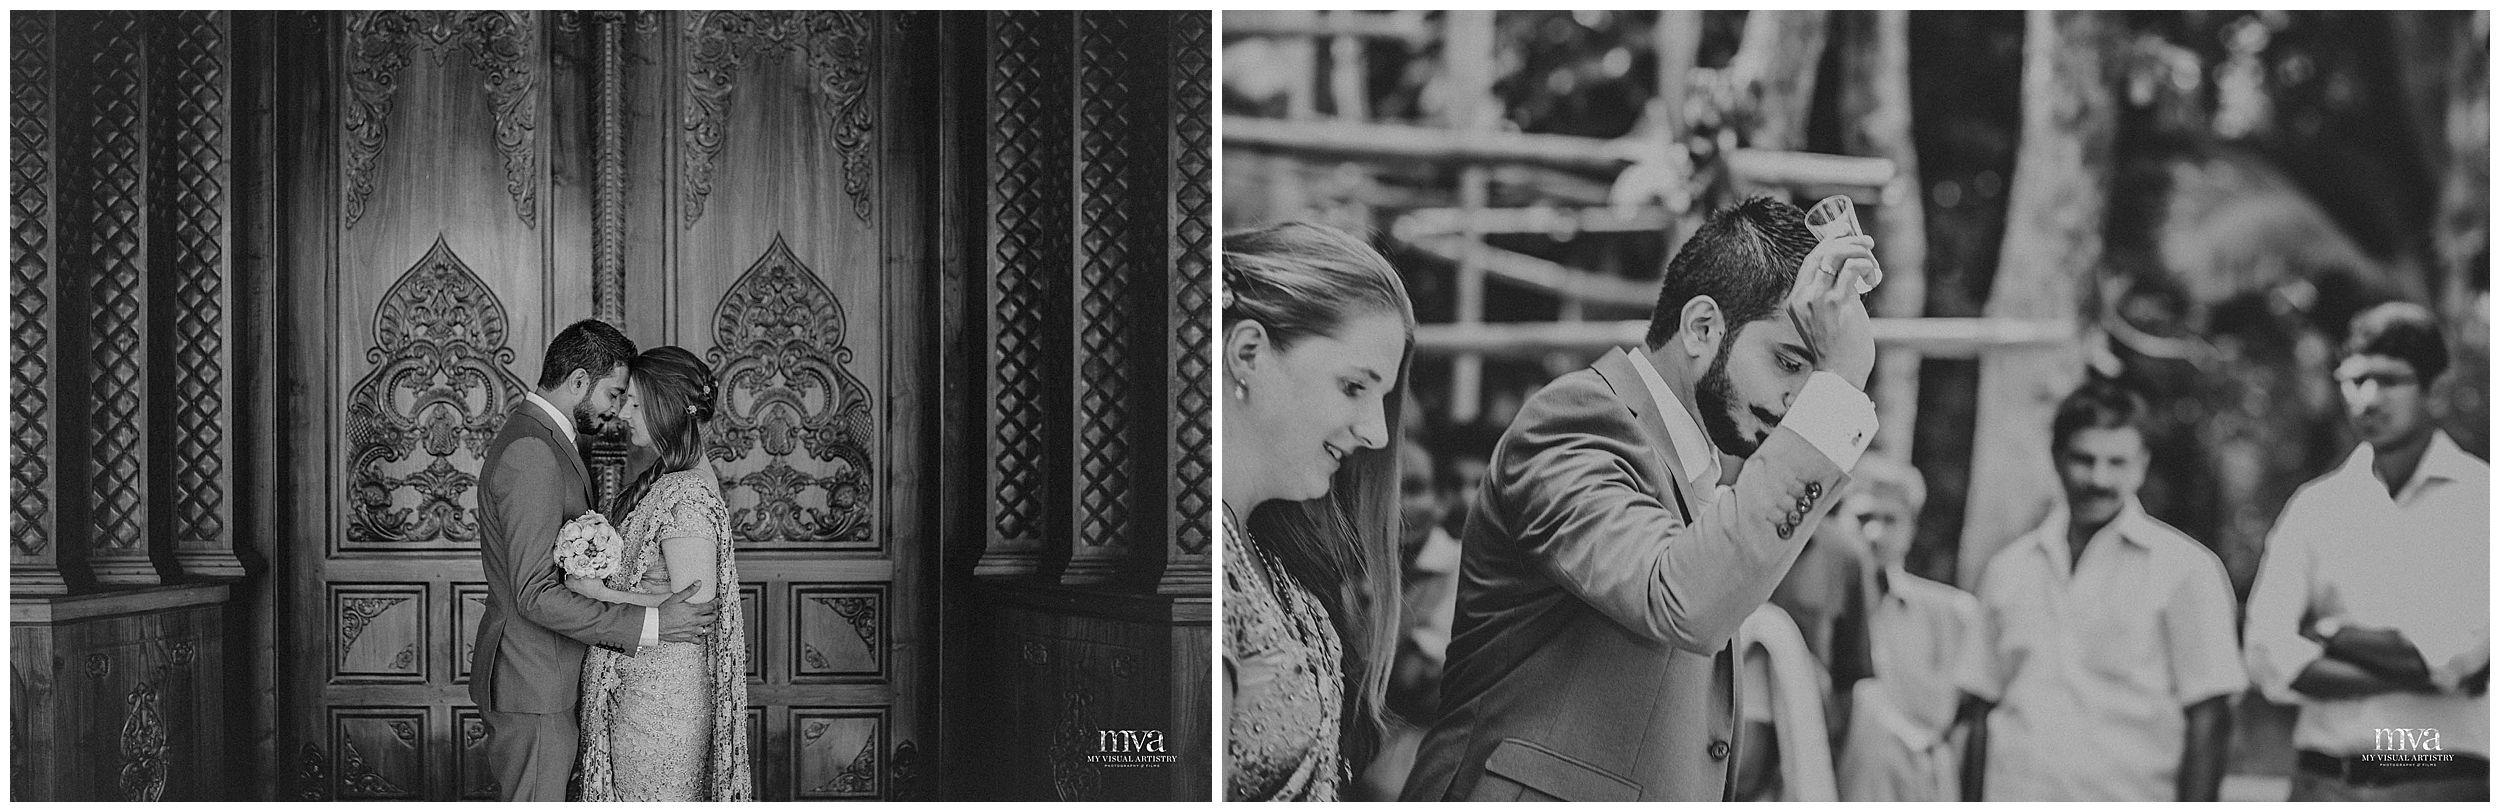 JOSEPH_LIDIA_MYVISUALARTISTRY_POLAND_WEDDING_PHOTOGRAPHER_MVA_JAIPUR_KERALA_MUNNAR_COCHIN_0025.jpg